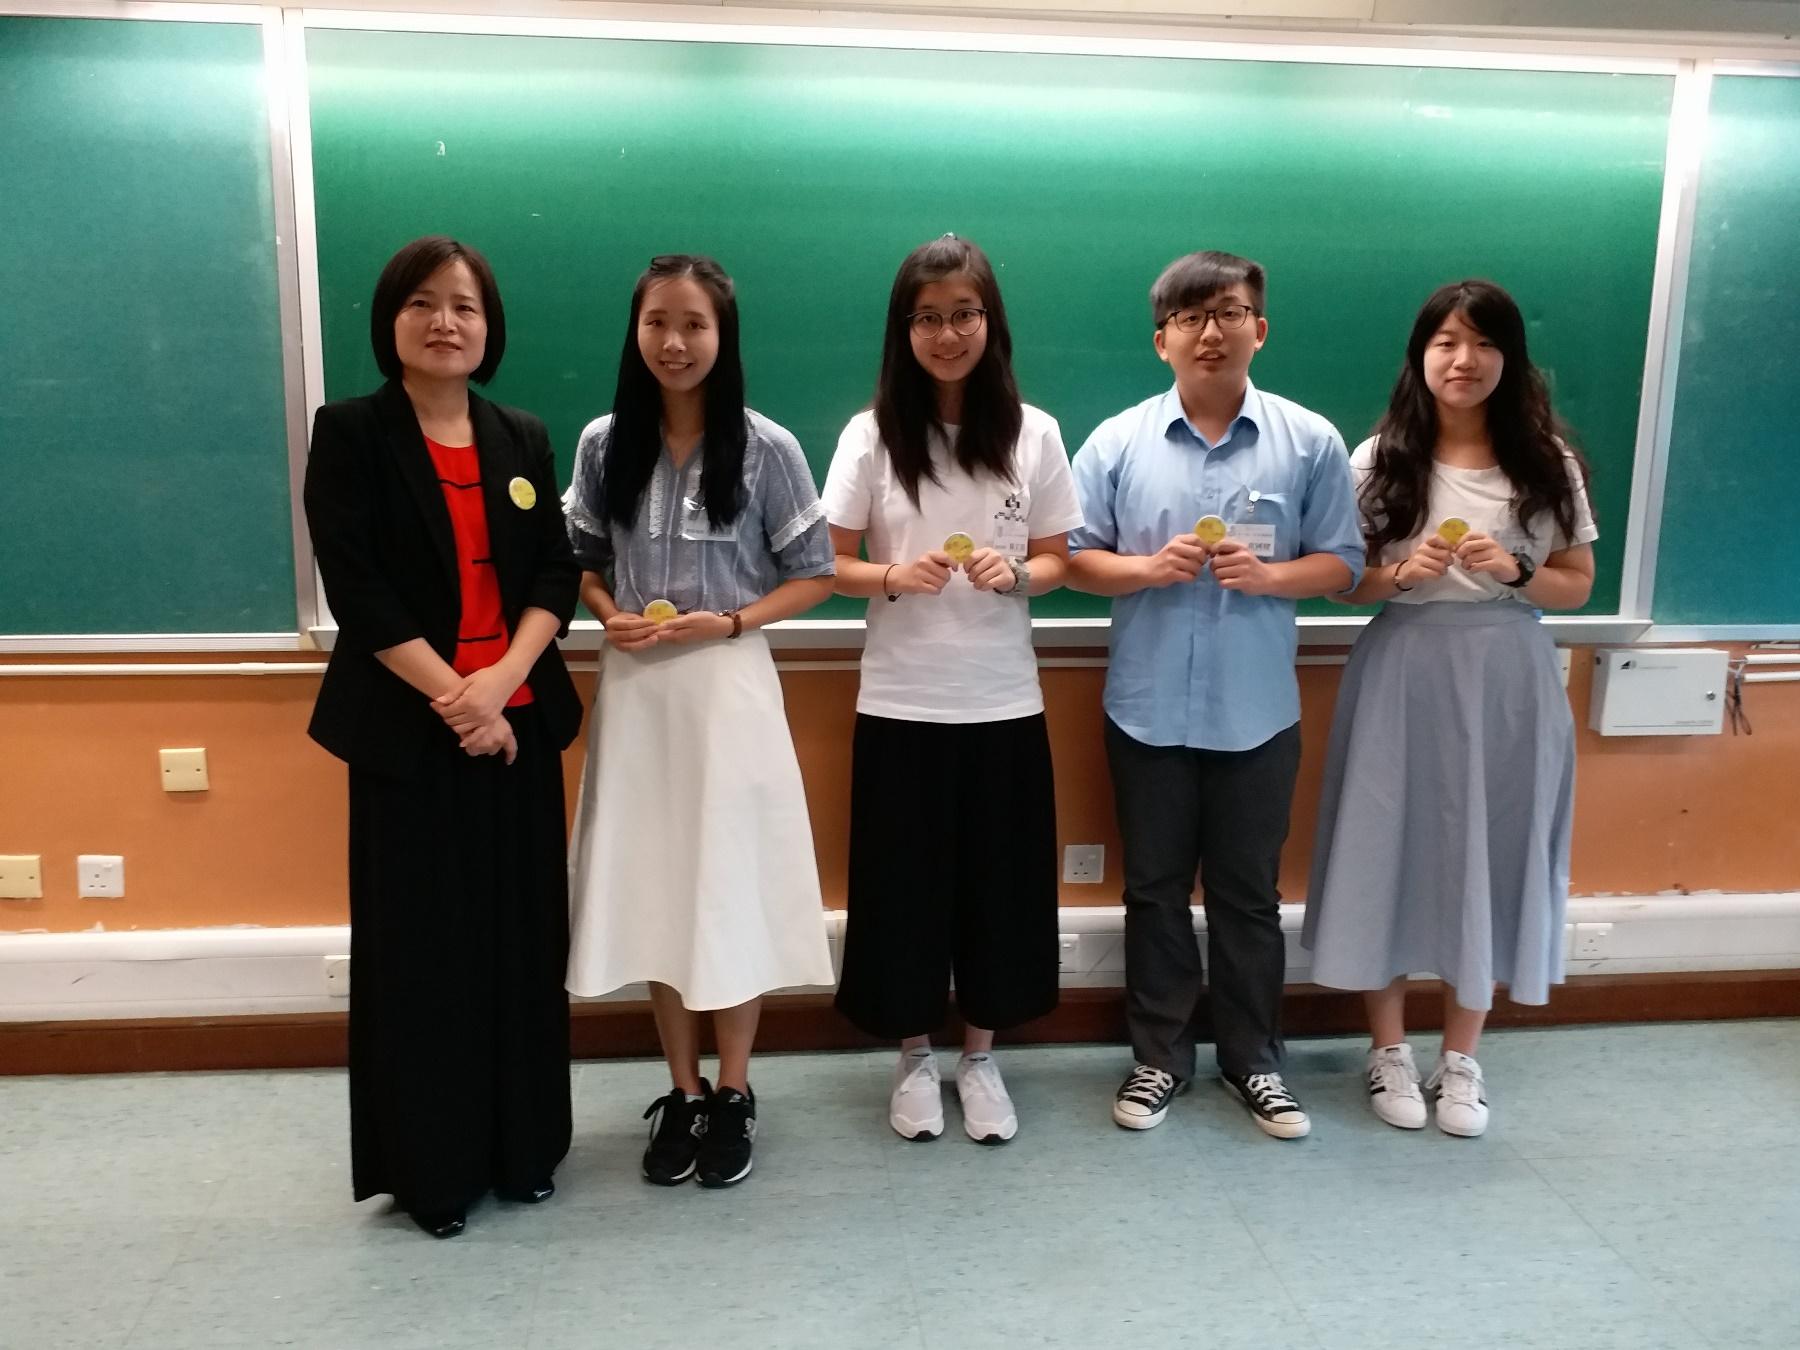 https://www.npc.edu.hk/sites/default/files/20180812_084749.jpg